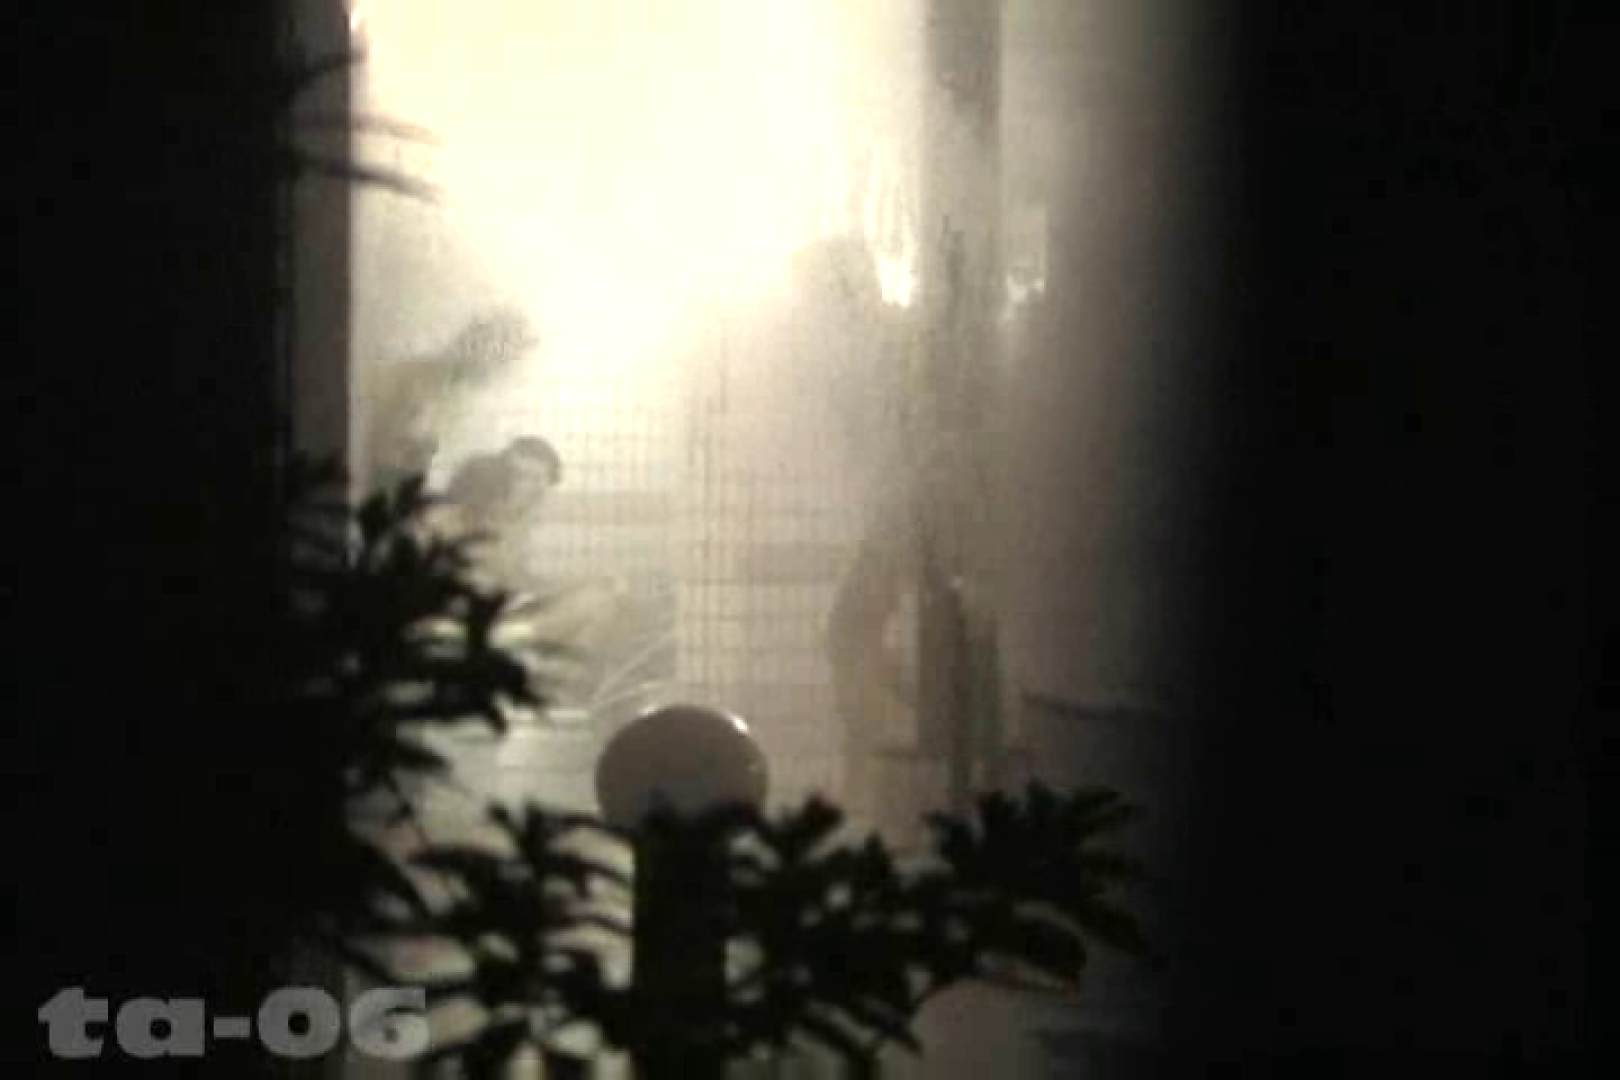 合宿ホテル女風呂盗撮高画質版 Vol.06 合宿中の出来事 SEX無修正画像 69画像 24